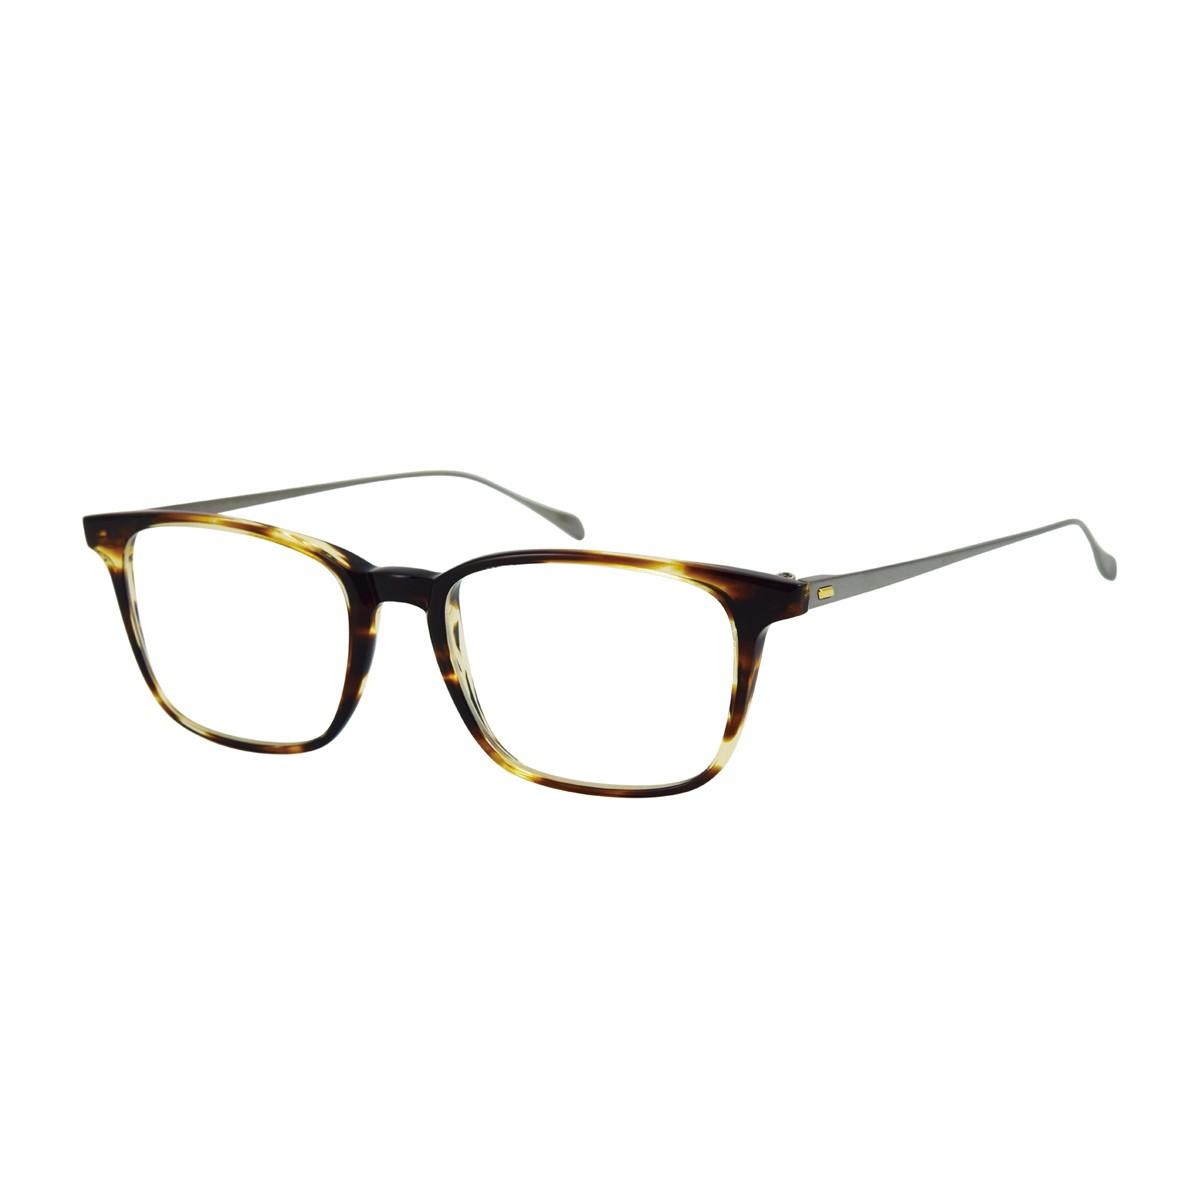 Masunaga GMS-09   Men's eyeglasses